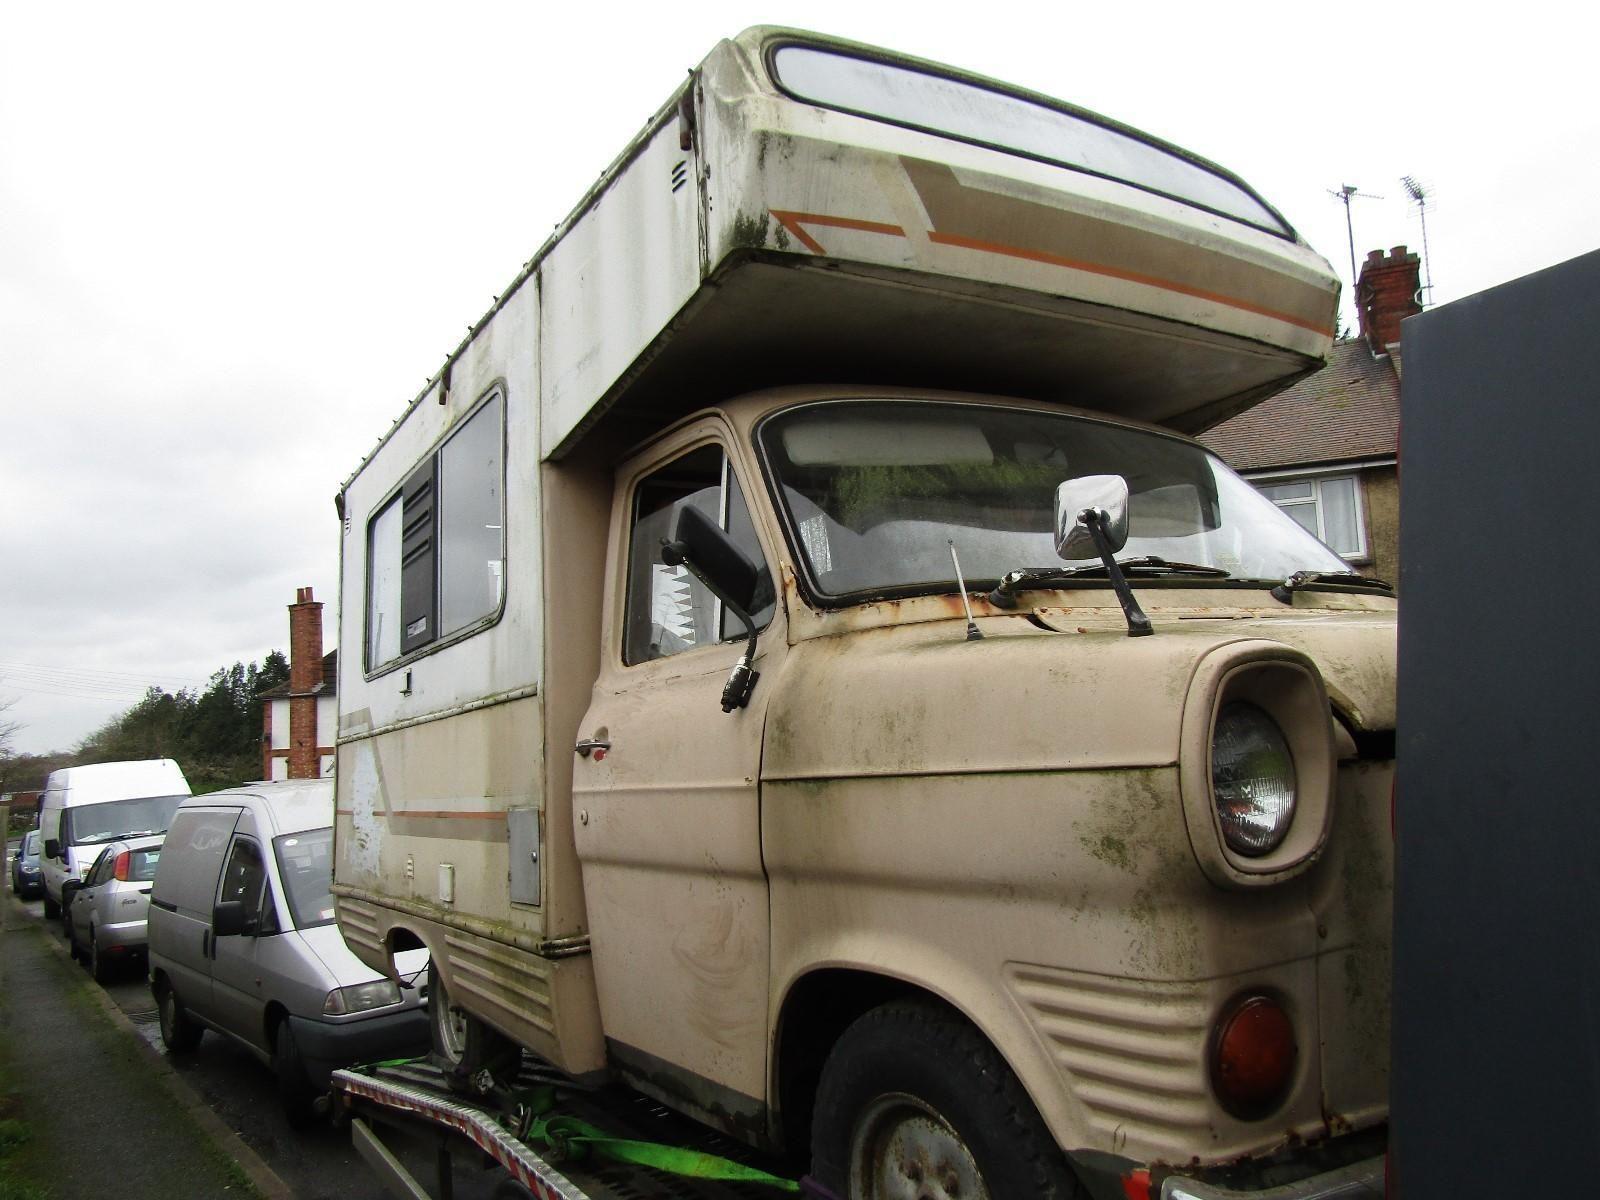 Ford Transit Mk1 Motor Caravan Barn Find In Cars Motorcycles Vehicles Campers